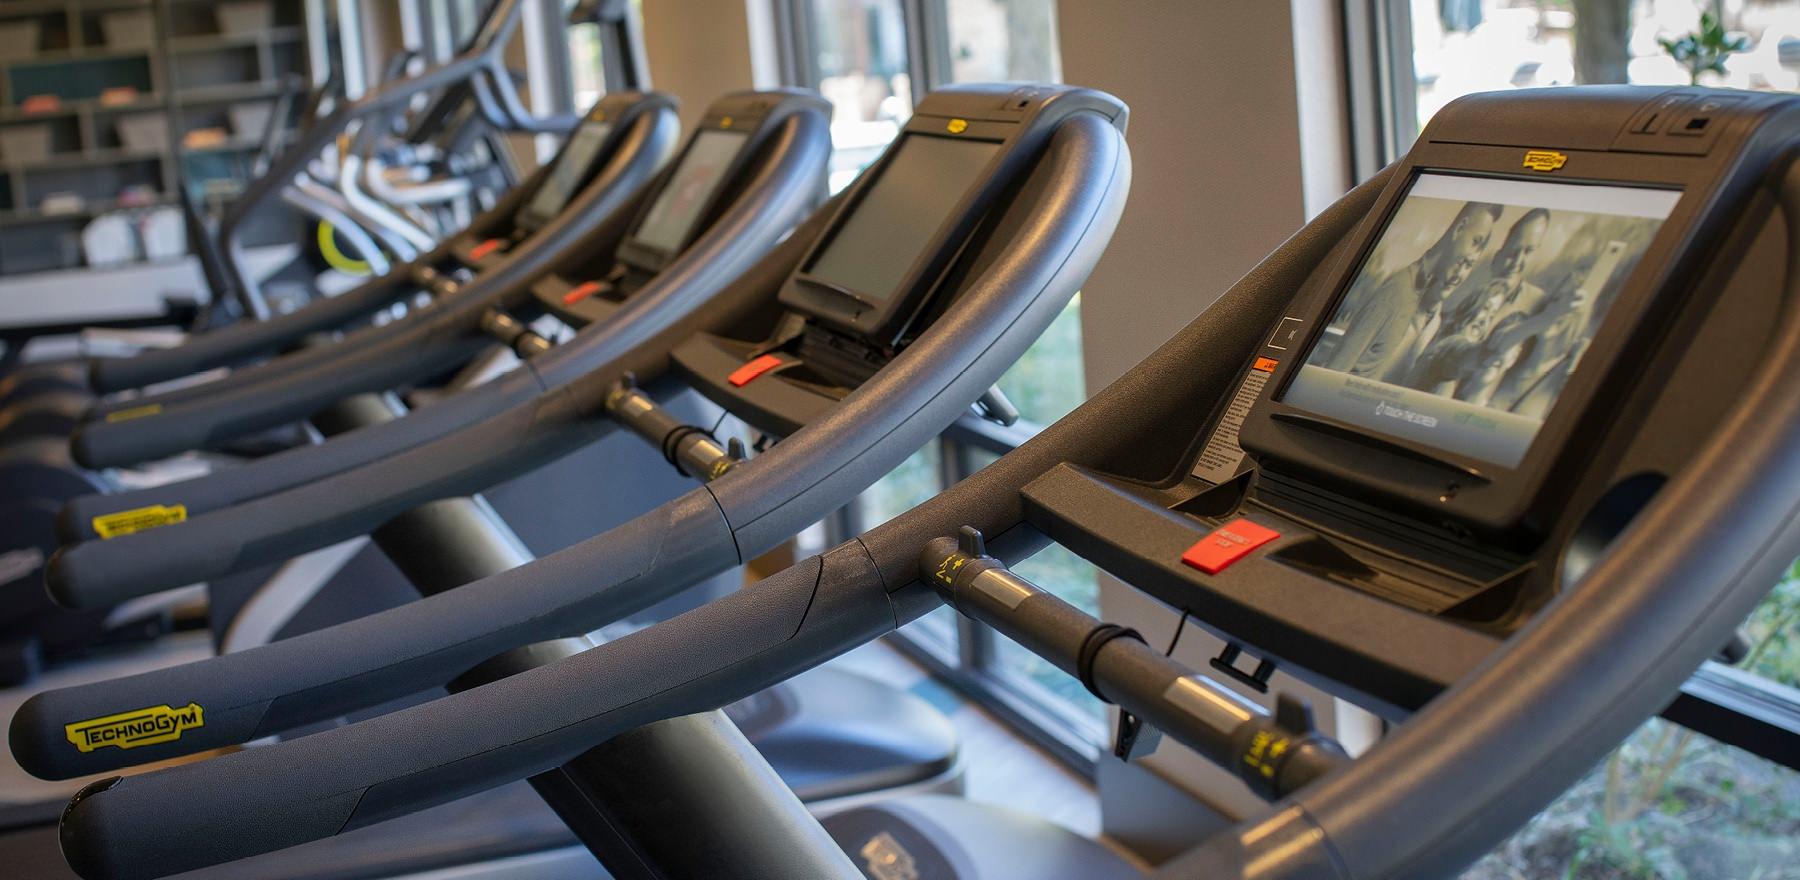 row of treadmills in fitness center